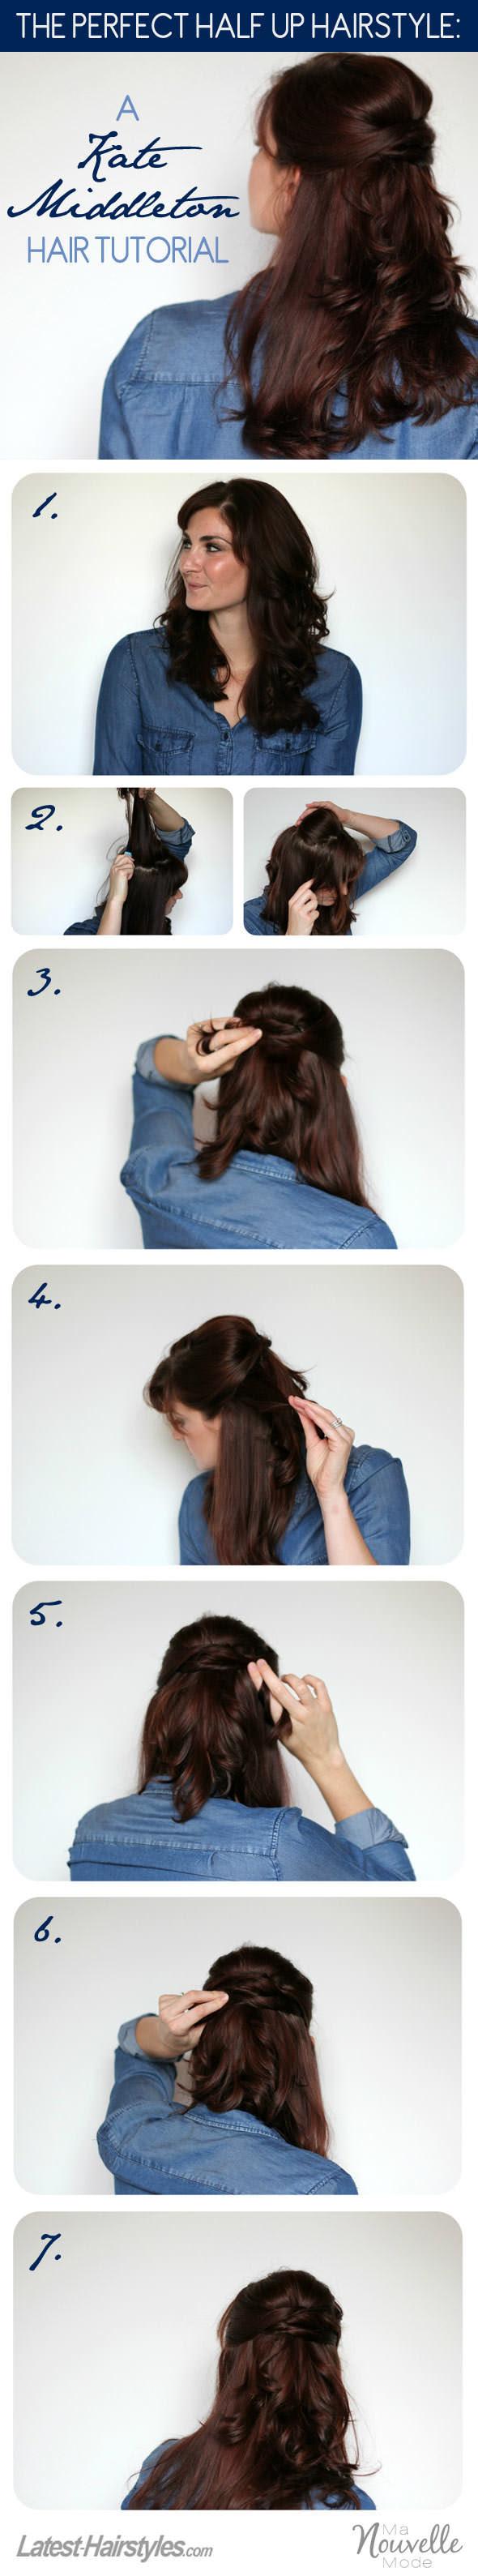 Kate Middleton's half up hair style tutorial